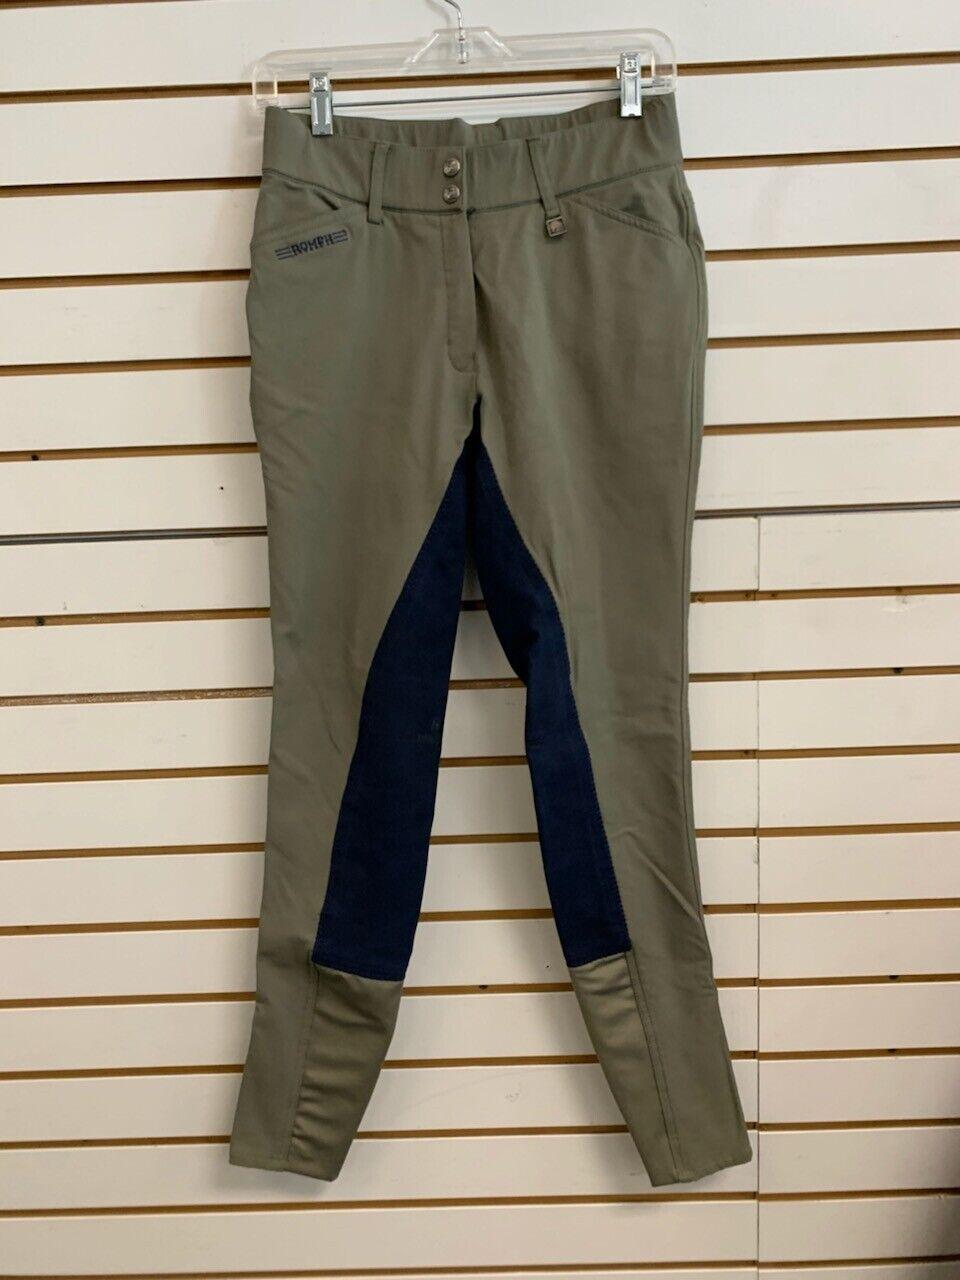 Pantalones de montar de asiento completo usado Romfh Sarafina-Tamaño  Damas 28  L EE. UU. - Oliva con Azul Marino